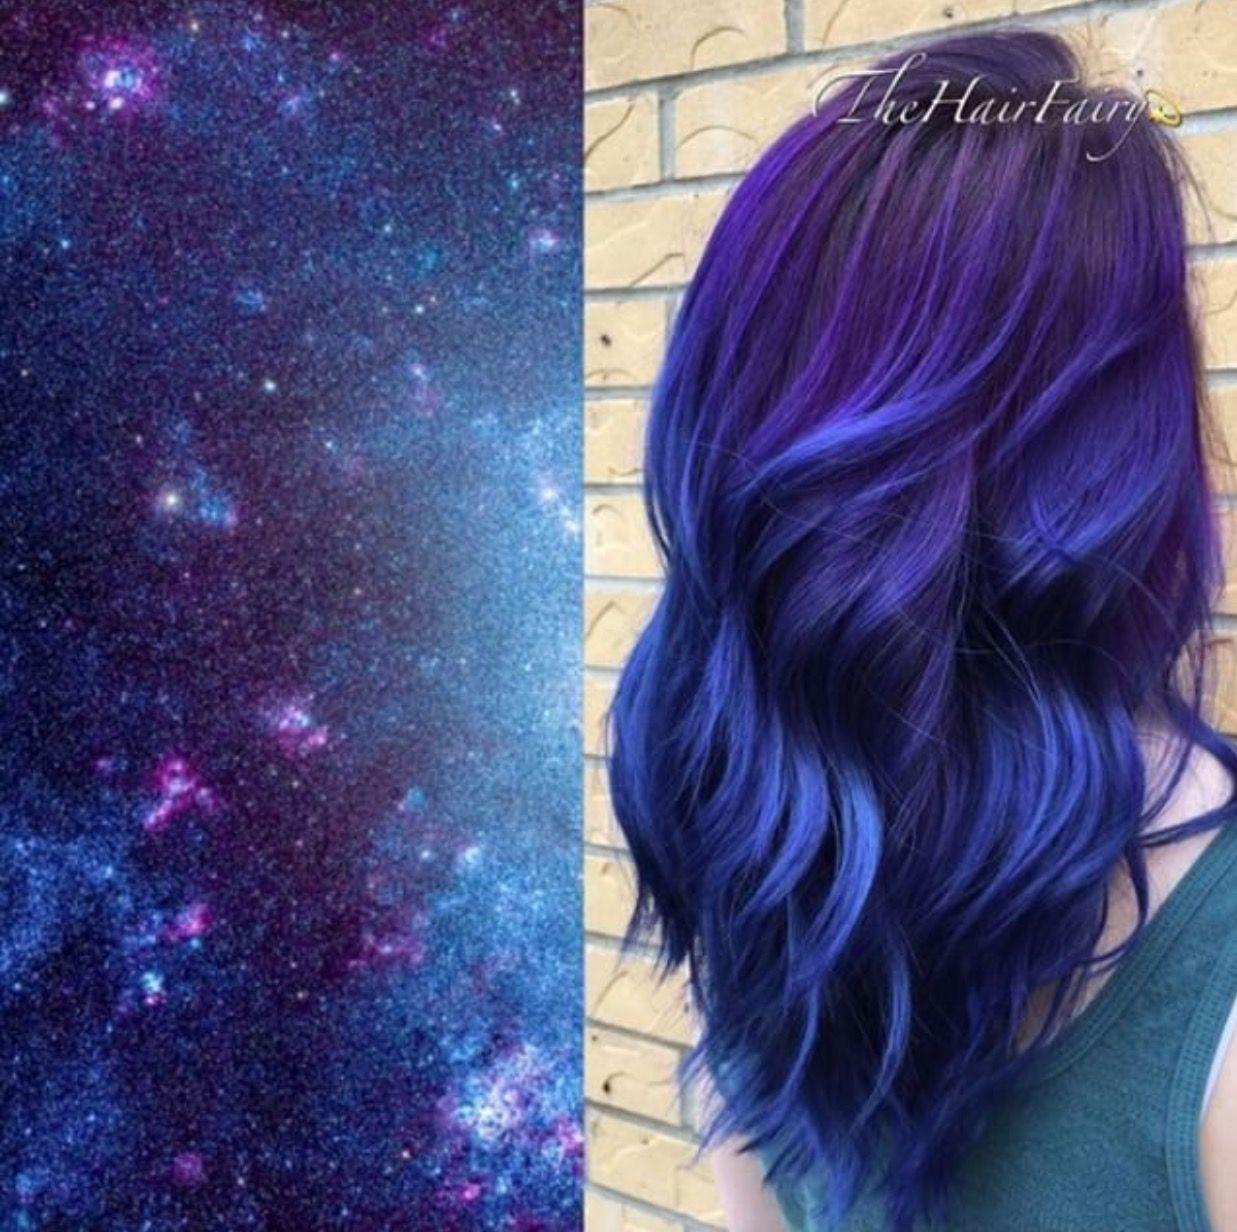 Pin by jillie bean on hair styles pinterest hair style